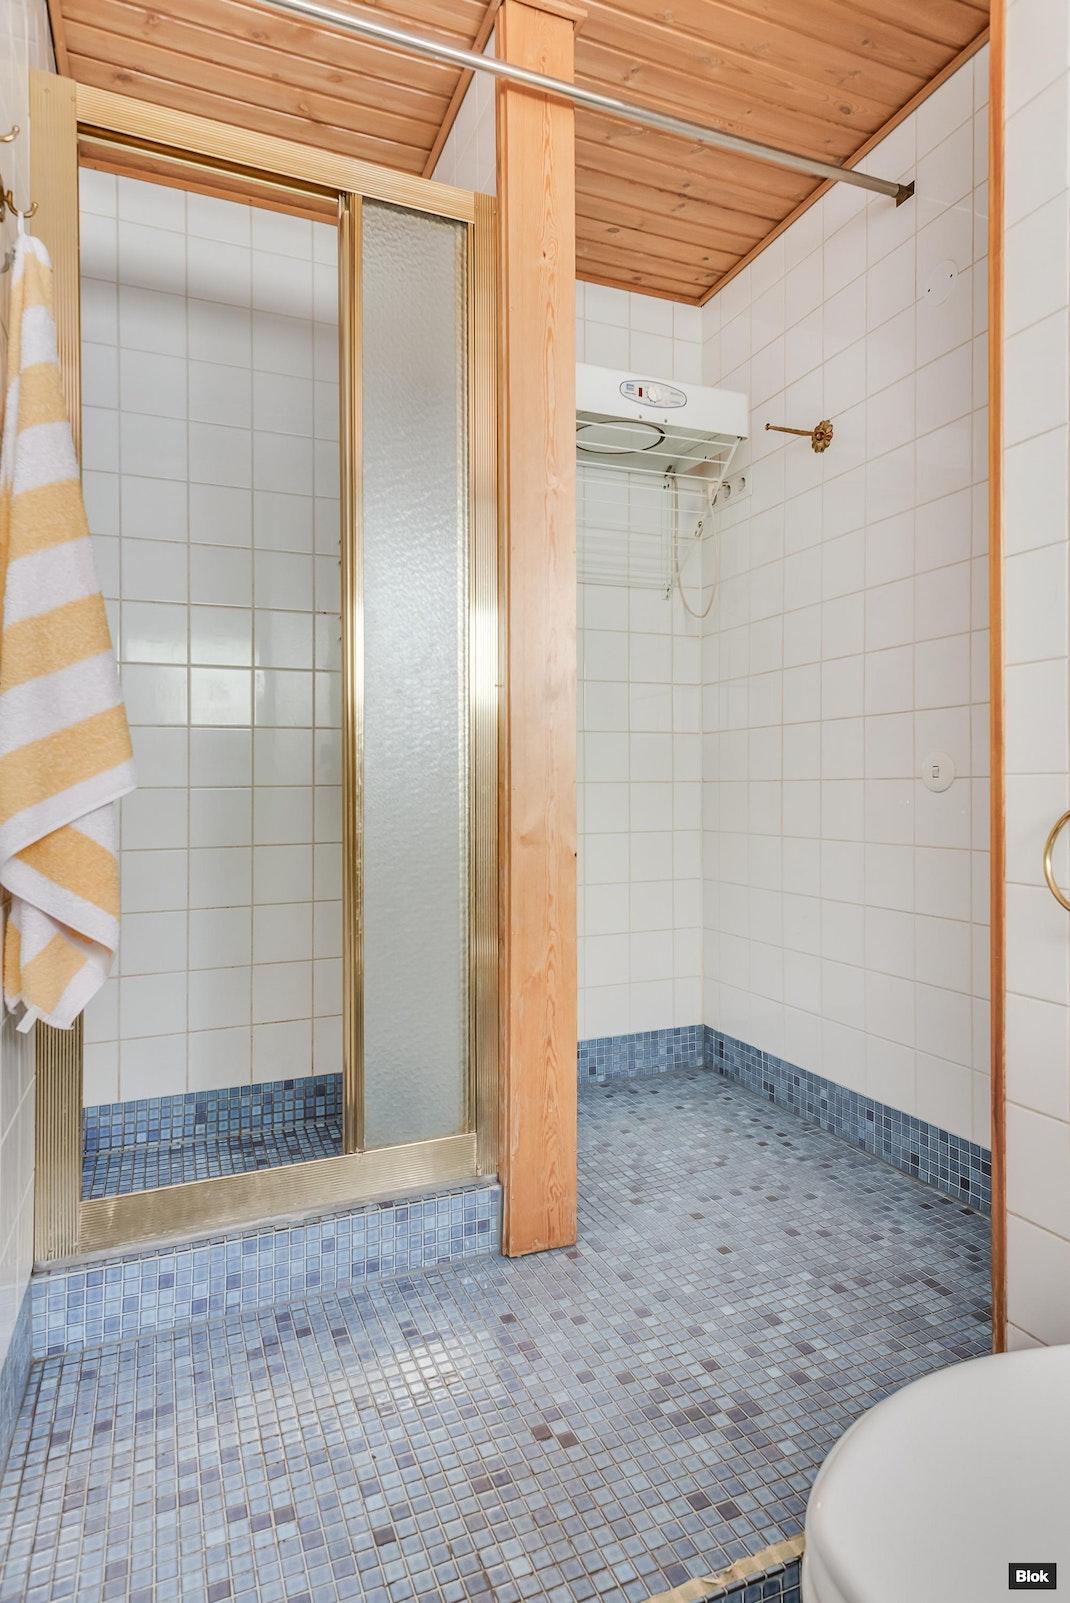 Soukankuja 2 A Kylpyhuone & Erillinen WC